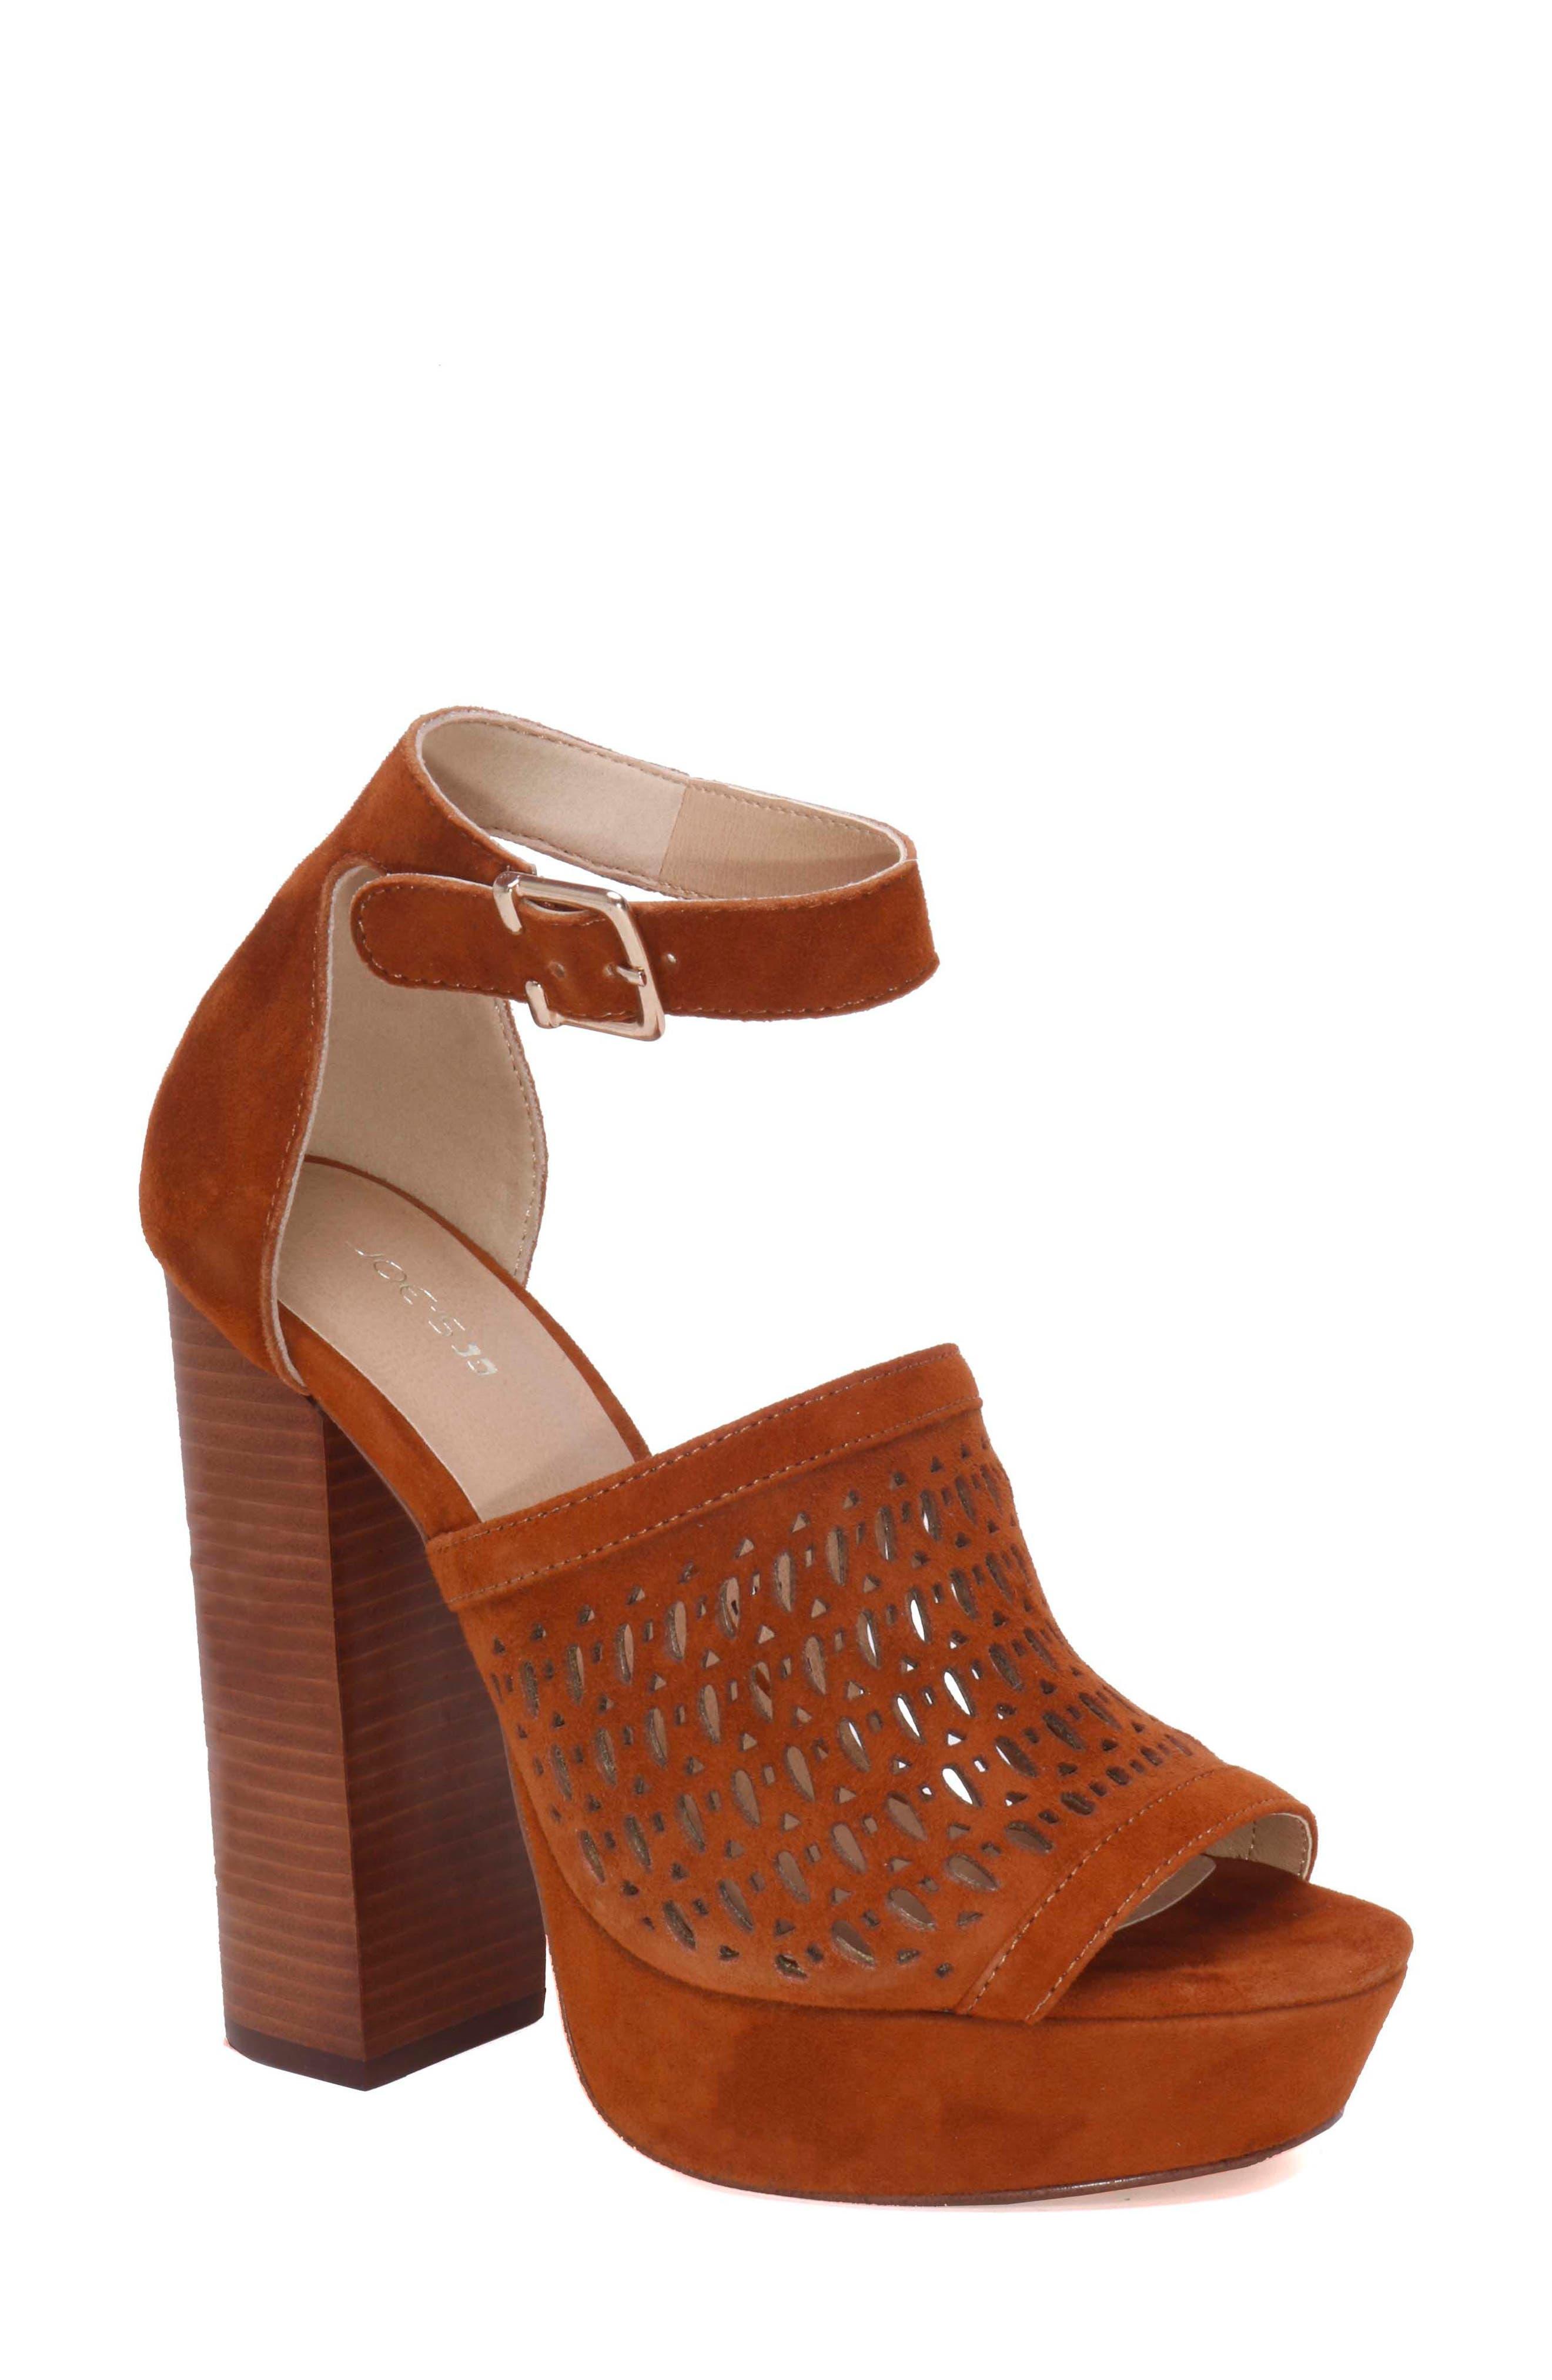 Main Image - Joe's Lorne Platform Sandal (Women)